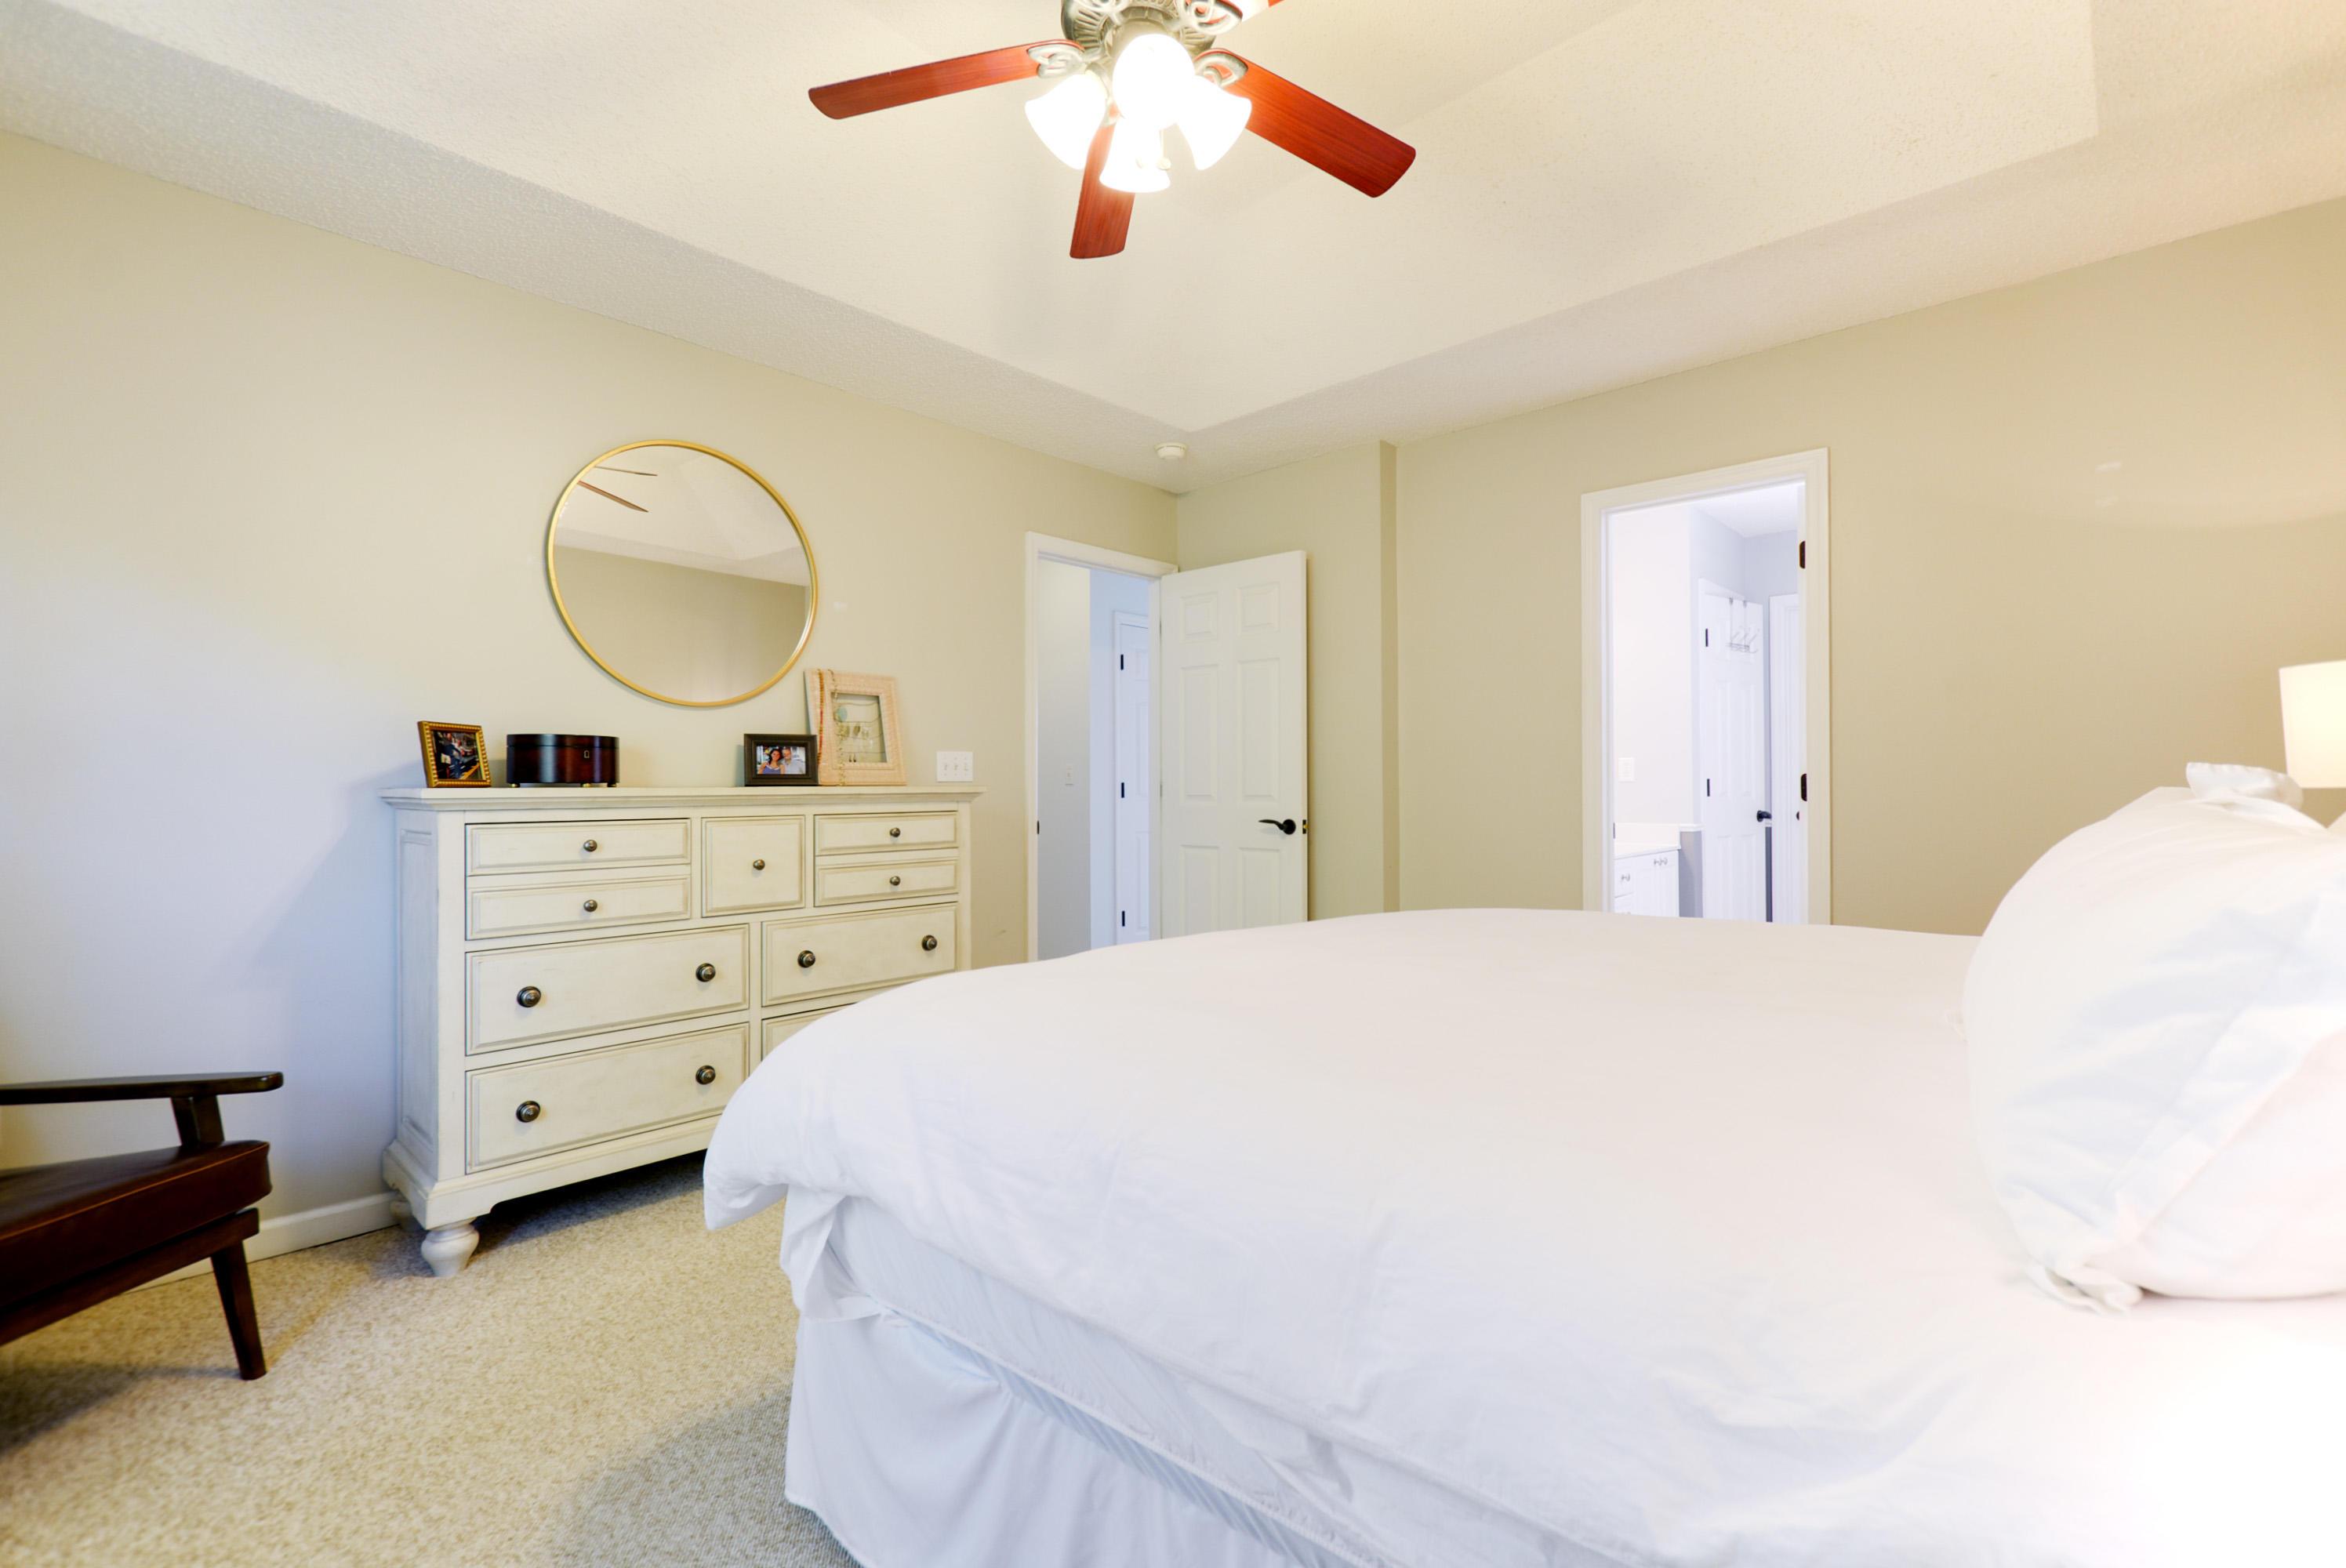 Ivy Hall Homes For Sale - 3087 Morningdale, Mount Pleasant, SC - 17